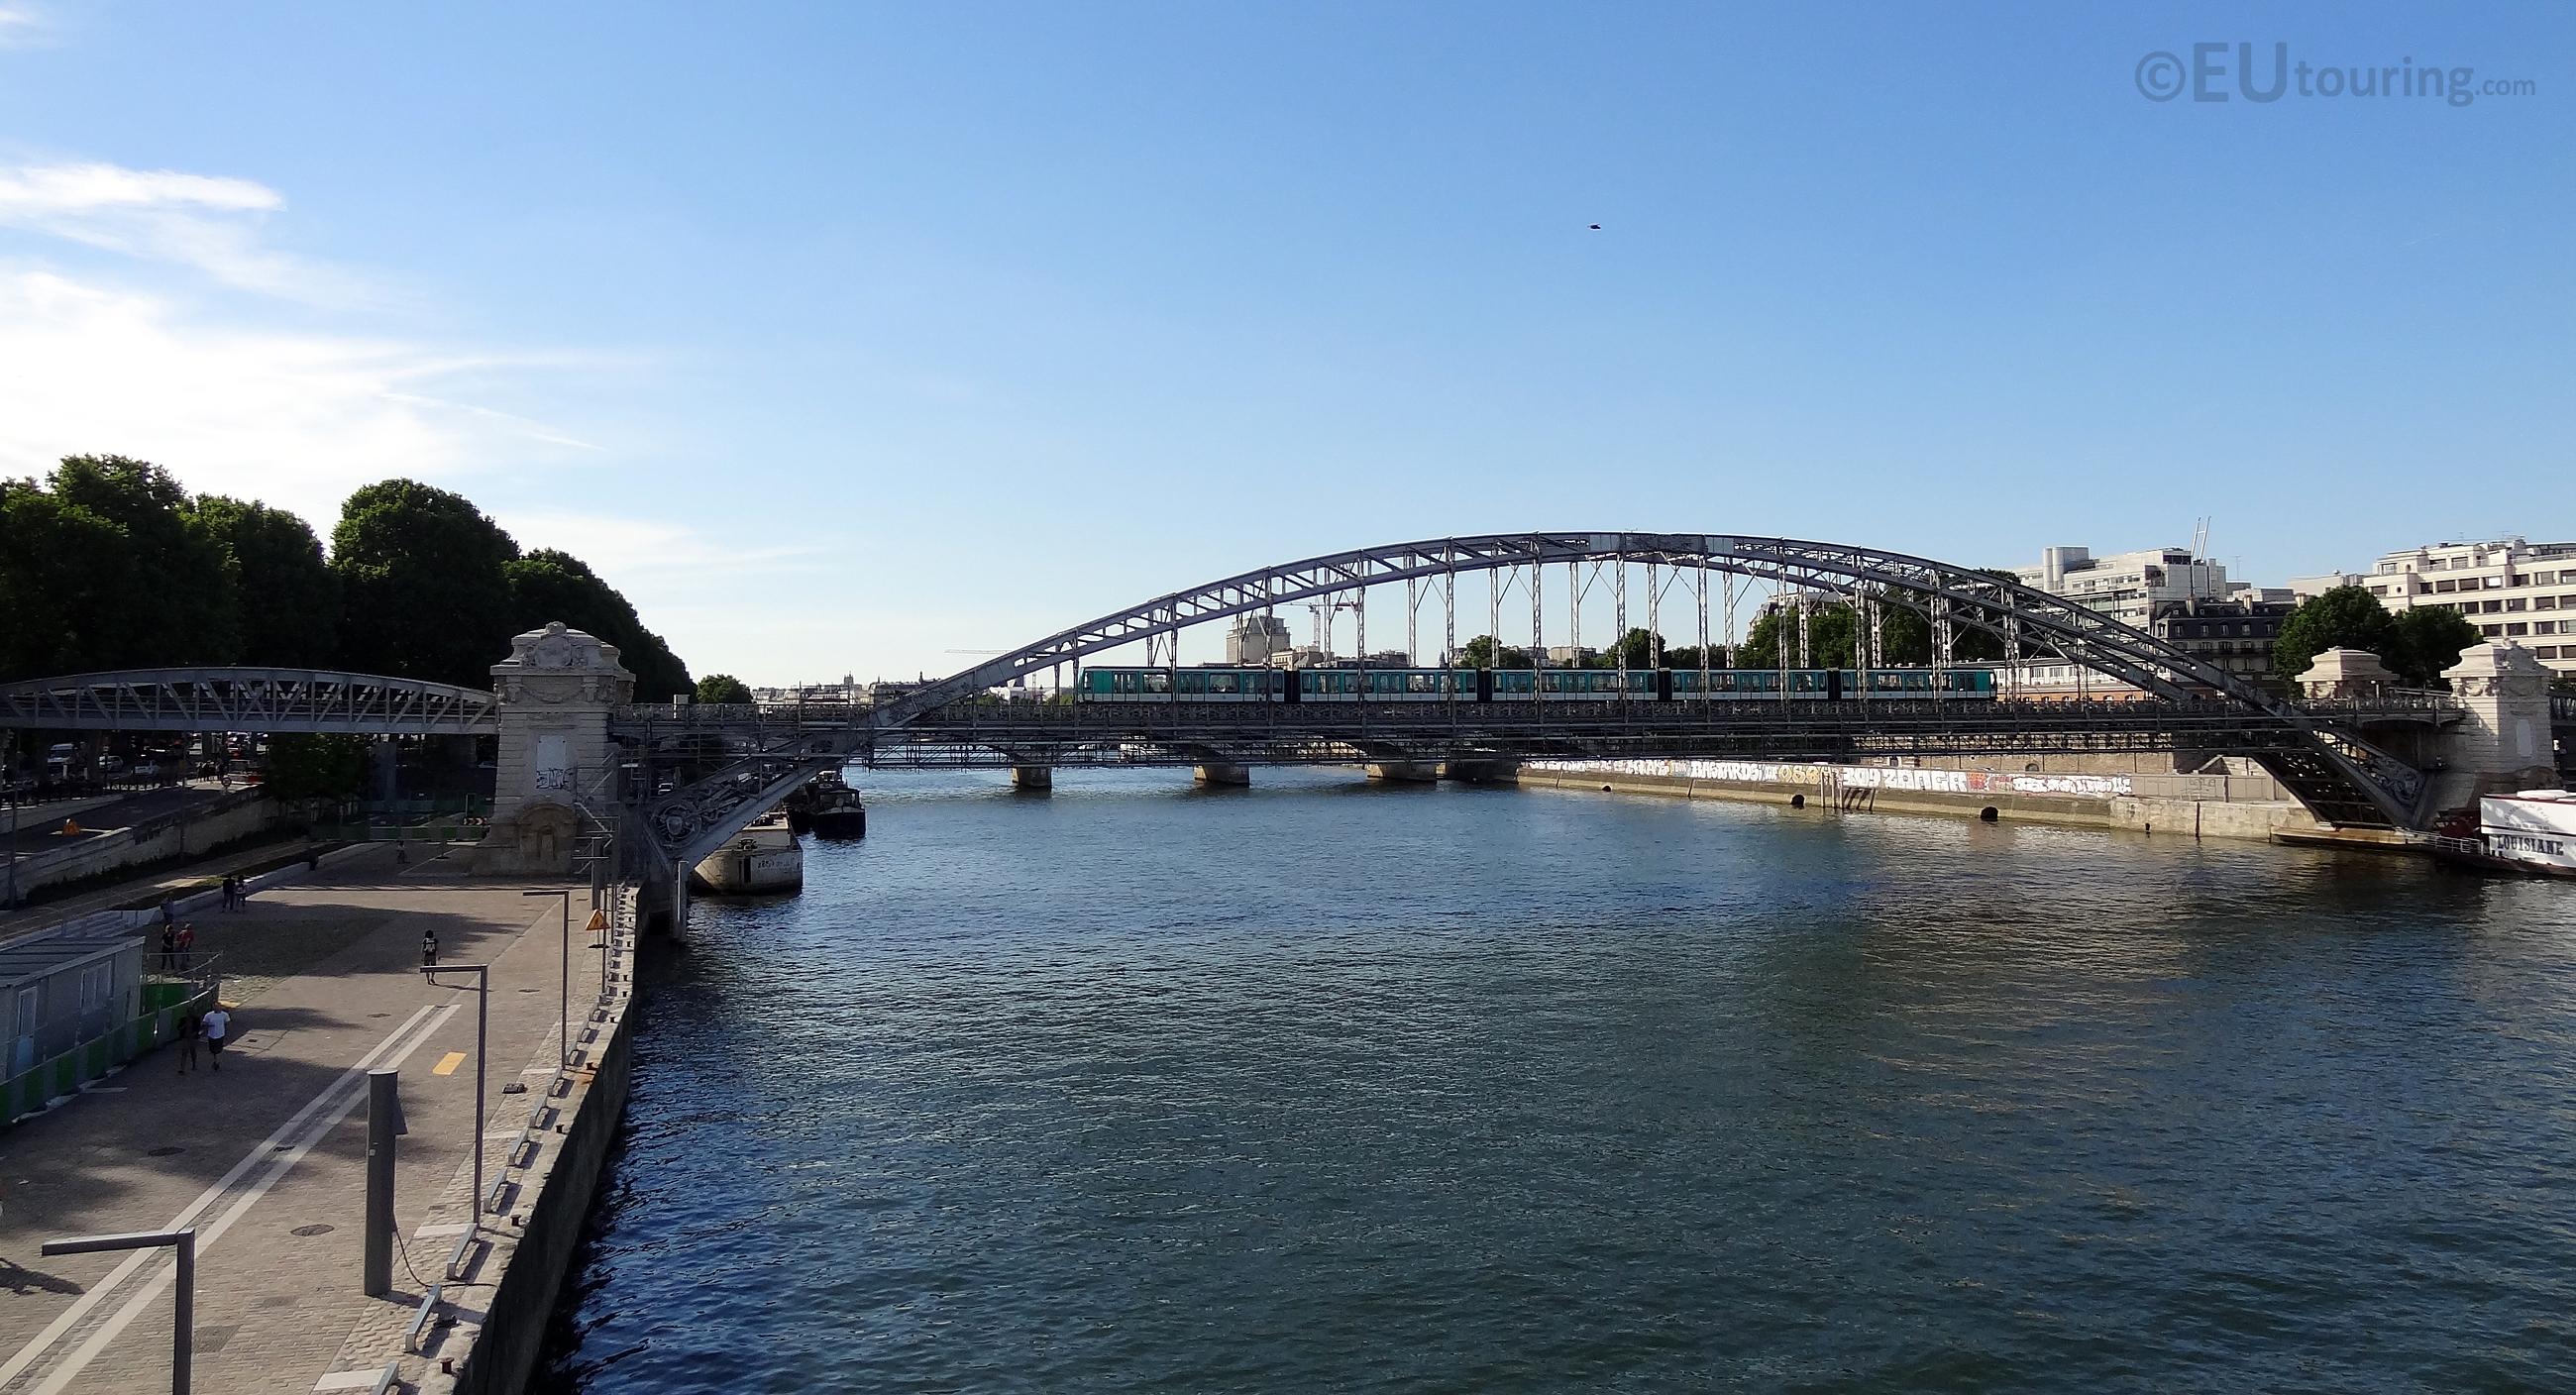 The Viaduc d'Austerlitz